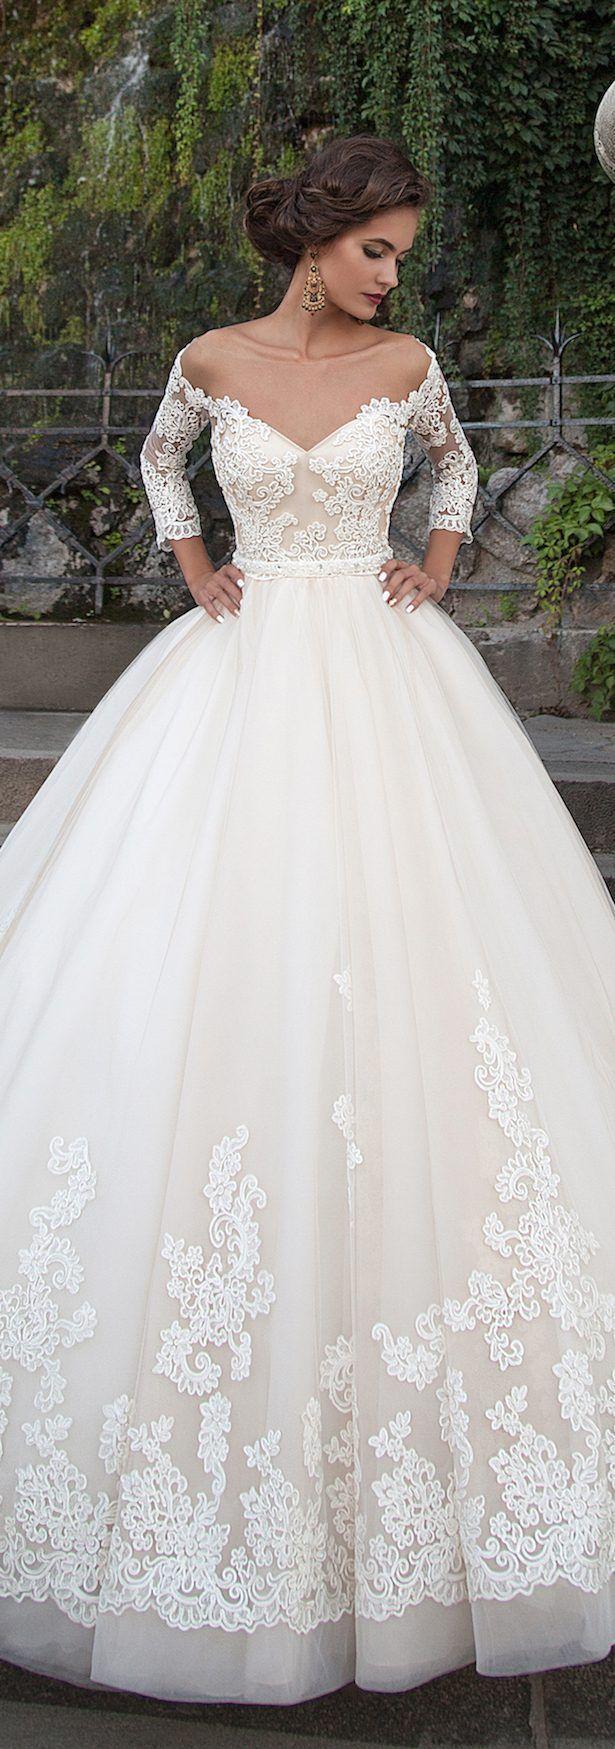 25  best ideas about Perfect wedding dress on Pinterest | Detailed ...